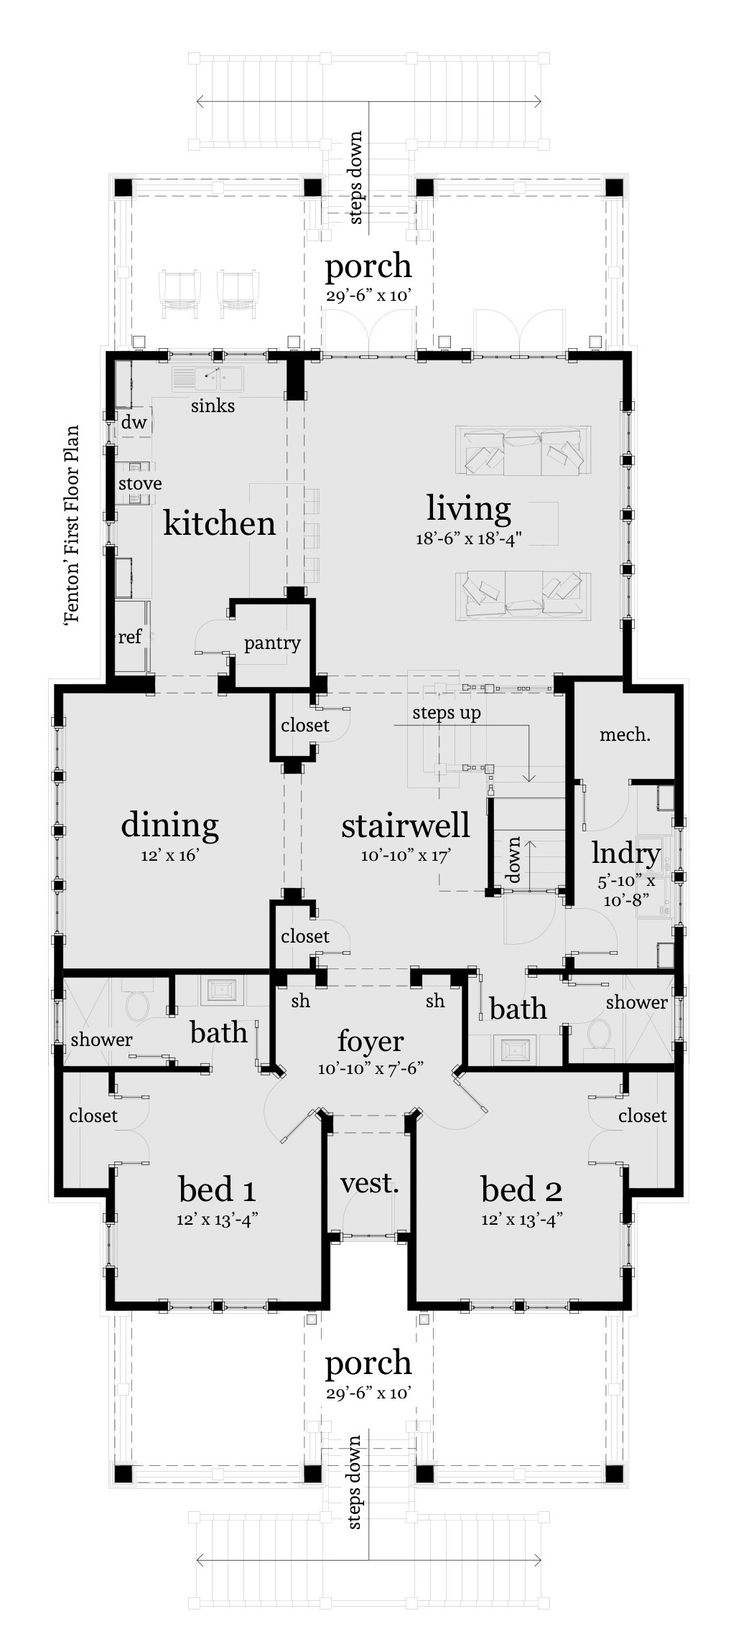 3939179719500efc09e1f29cf180b17d shop house plans beach house plans